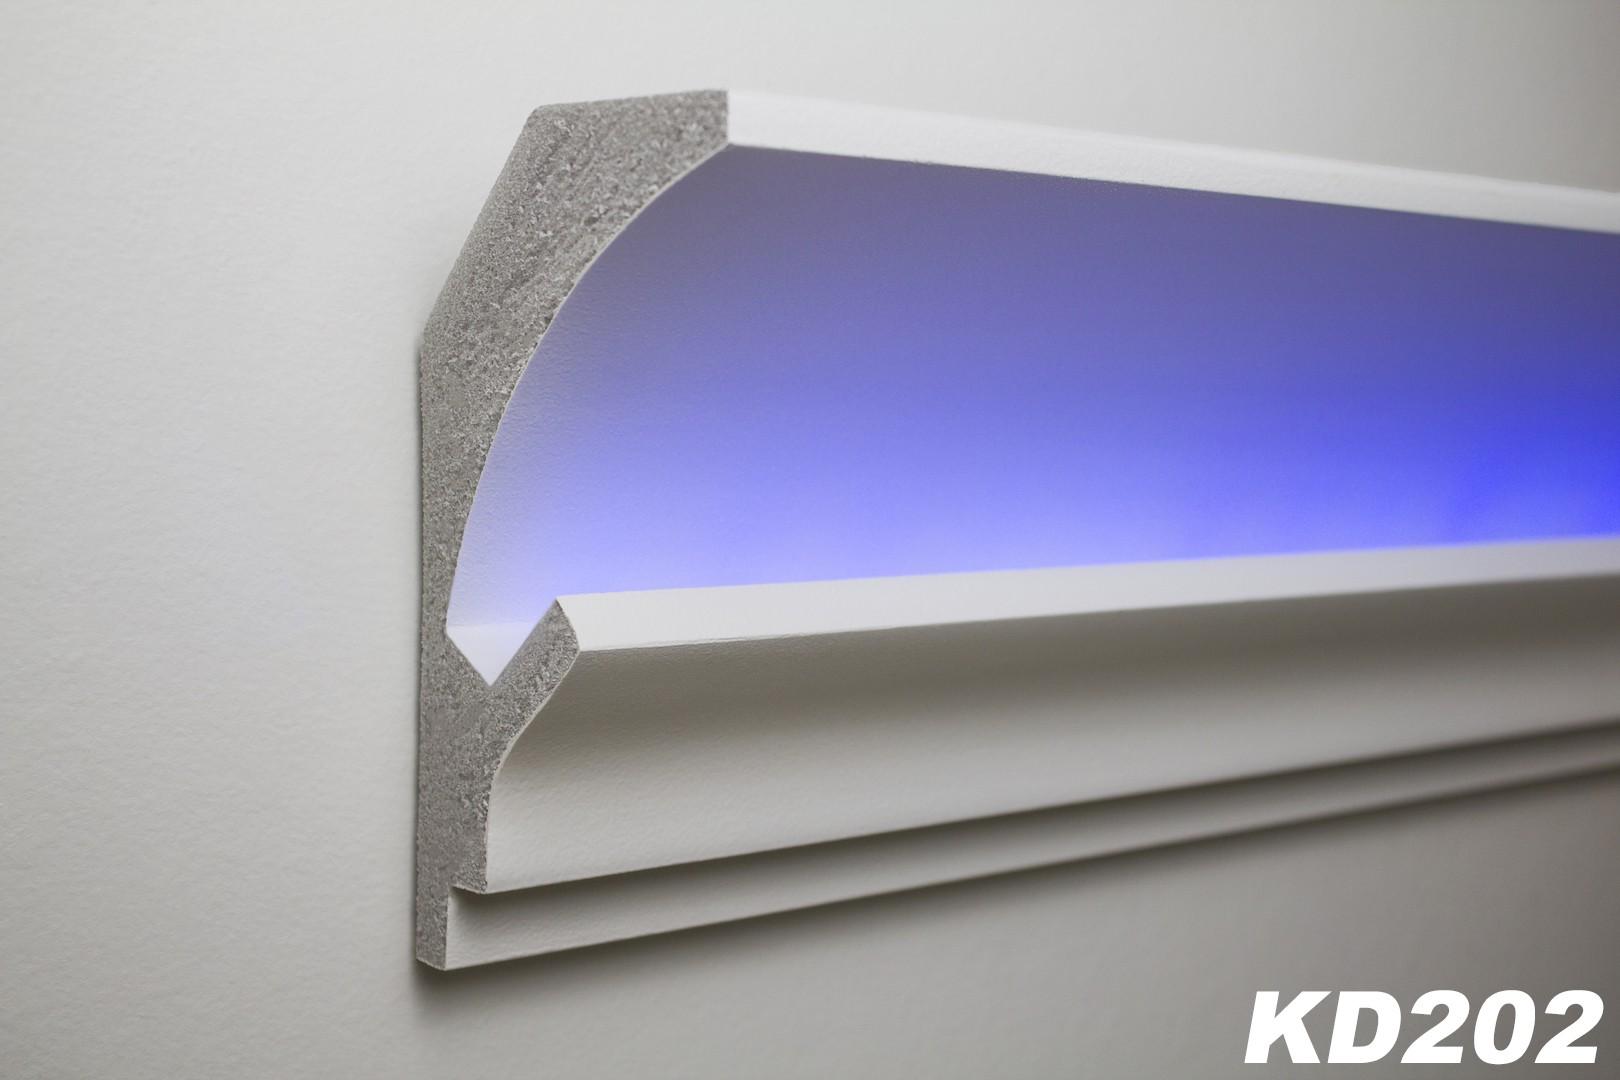 Charming 1,15 Meter LED Stuckleiste Für Indirekte Beleuchtung XPS 150x90mm, KD202